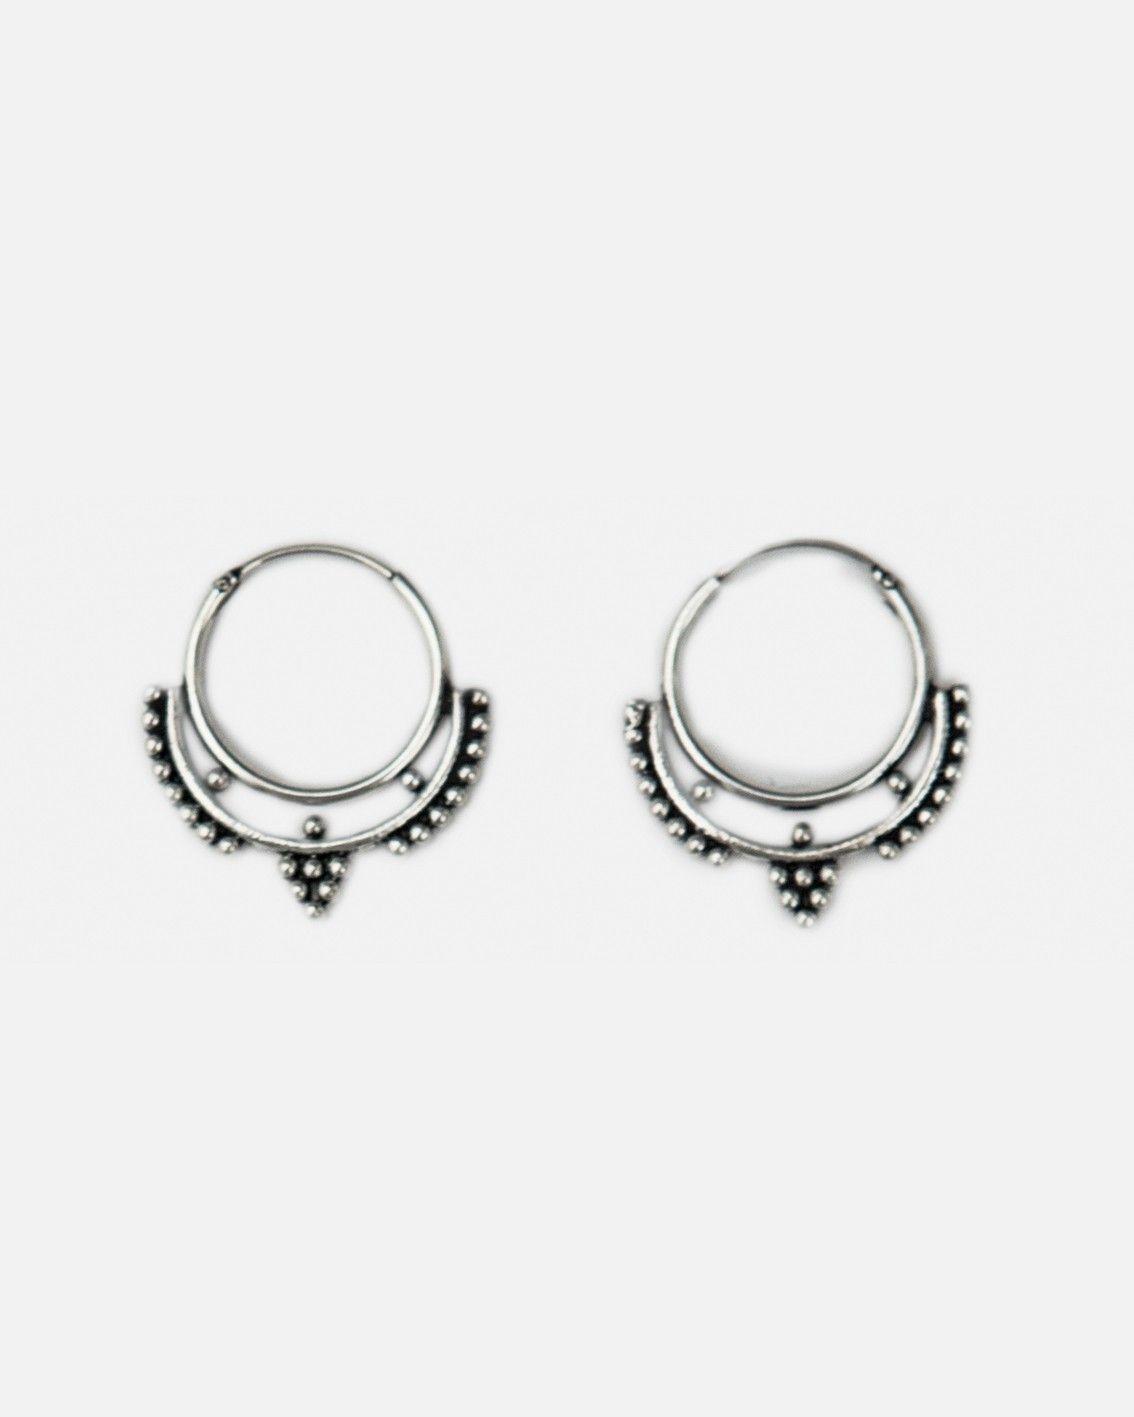 Piercing jewellery names  Fashionology  Sterling Silver Vee Hoop Earrings mm  E